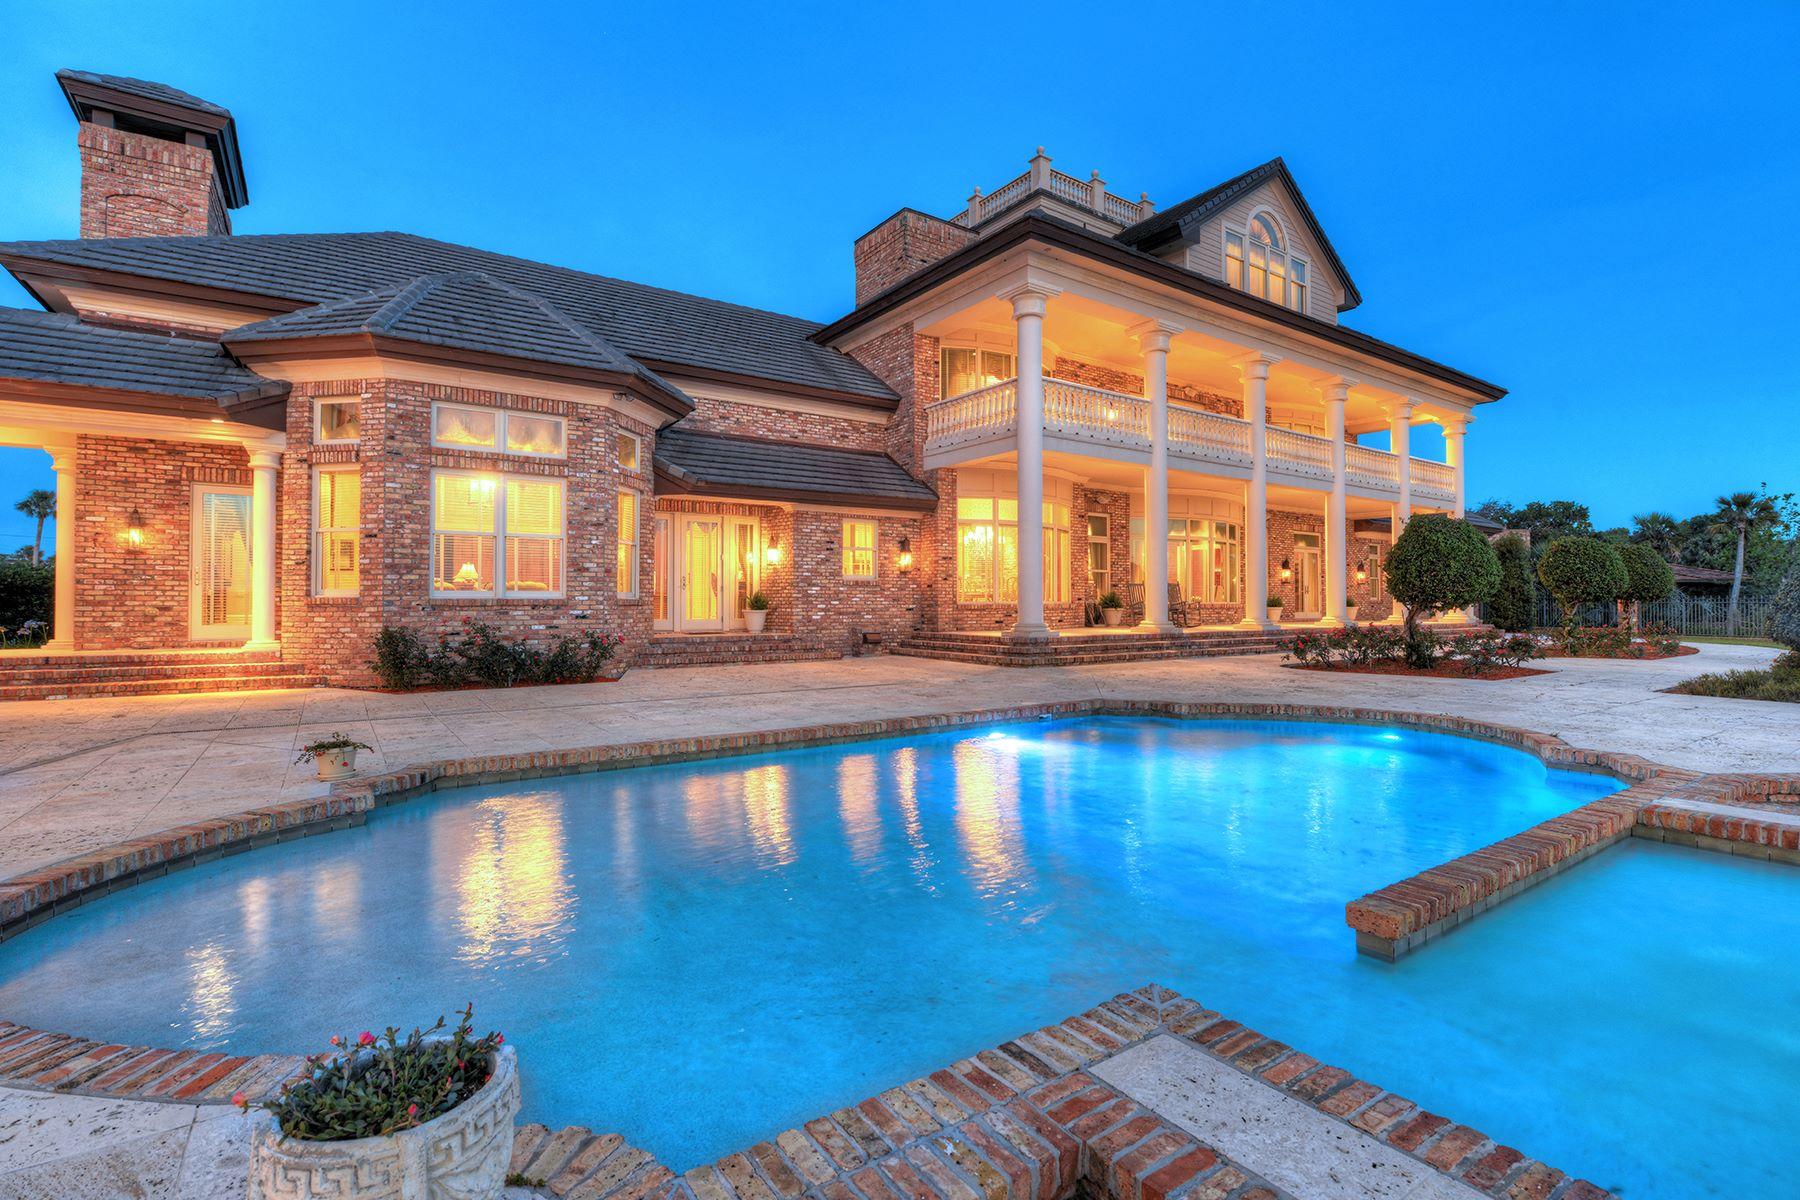 Additional photo for property listing at SPRUCE CREEK AND THE BEACHES - DAYTONA BEACH 1924 S Peninsula Dr,  Daytona Beach, Florida 32118 United States